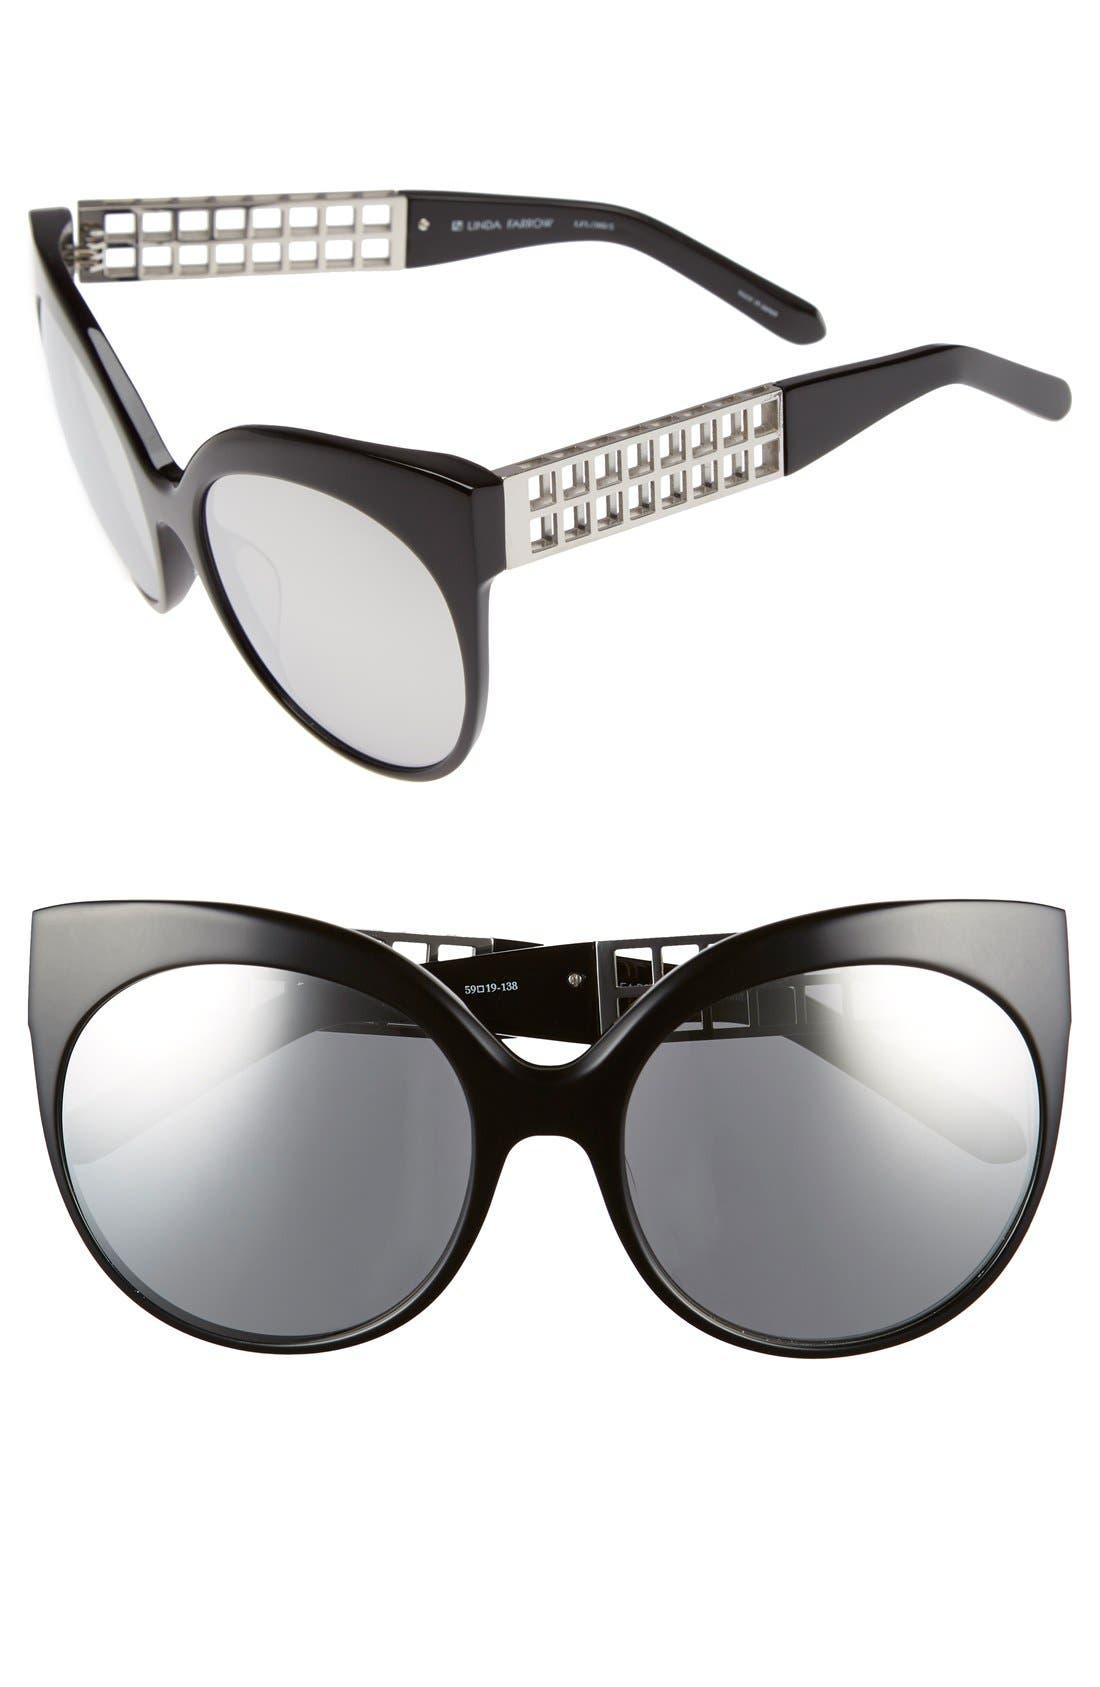 Main Image - Linda Farrow 59mm Cat Eye 18 Karat White Gold Trim Sunglasses